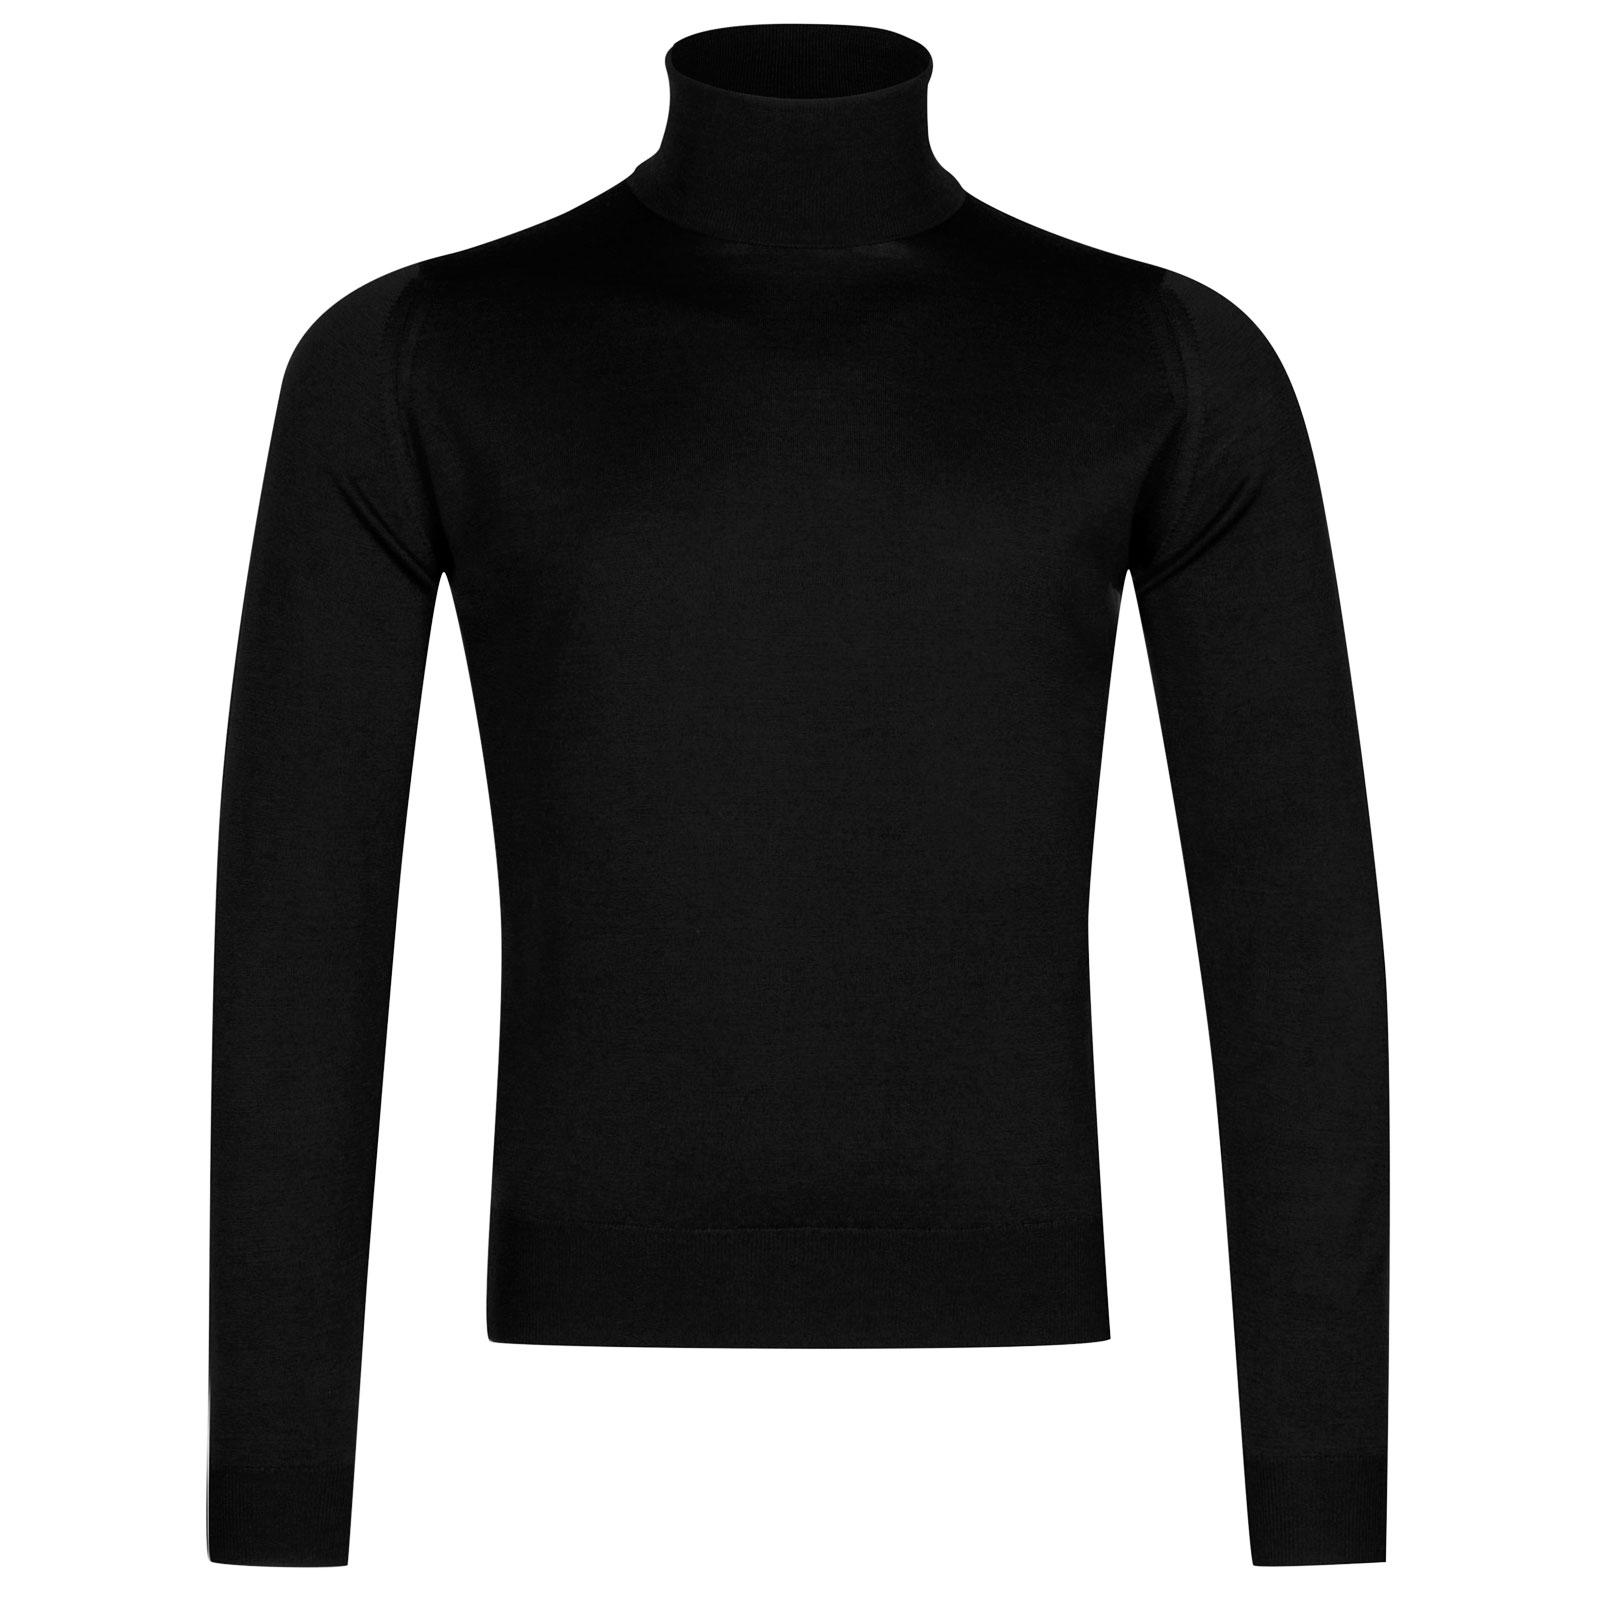 John Smedley Orta Merino Wool Pullover in Black-XL